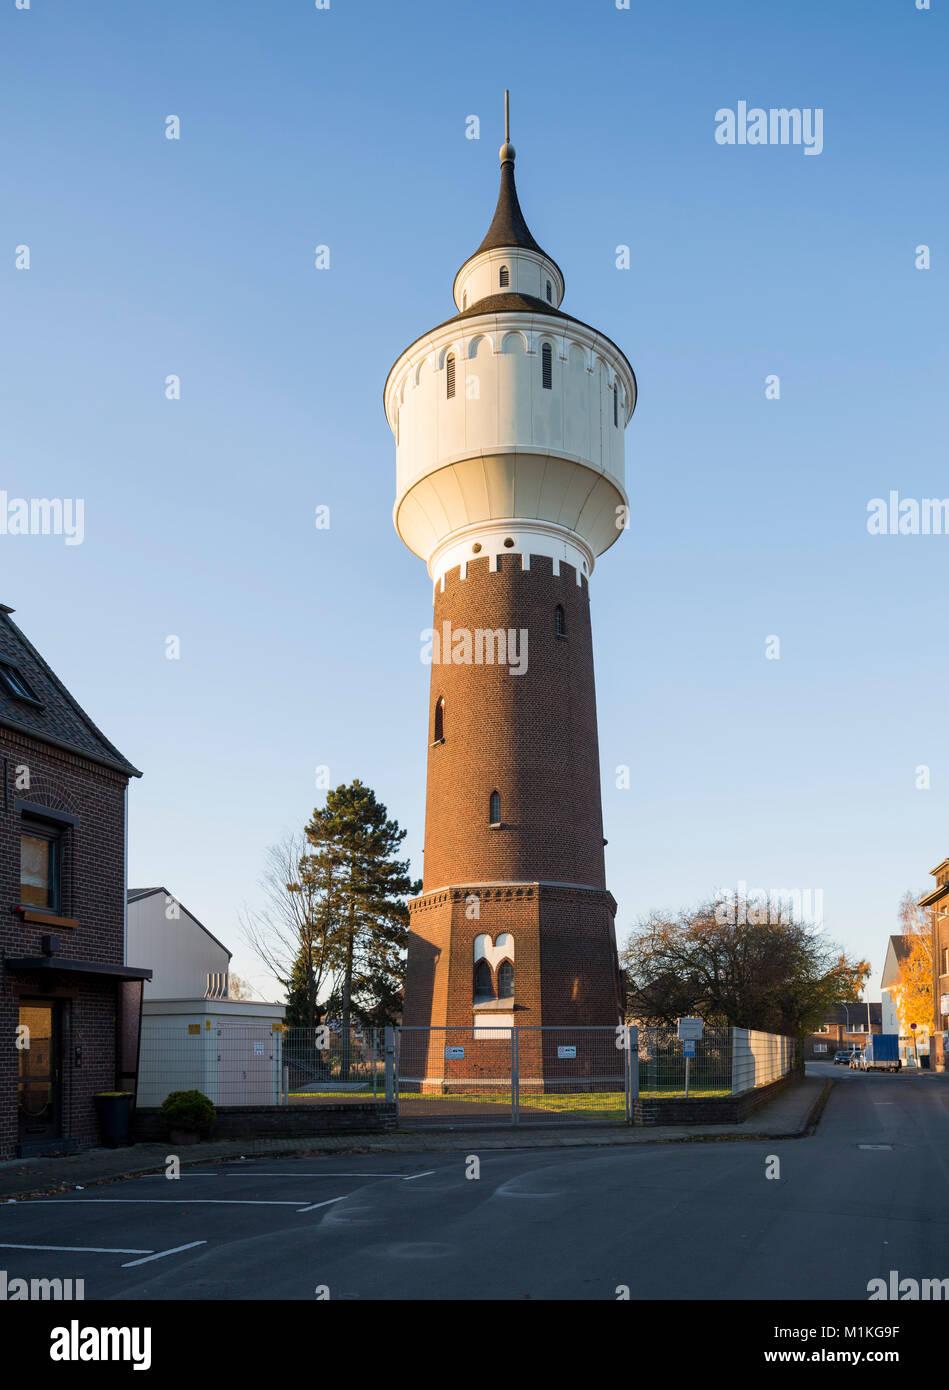 Krefeld-Hüls, Wasserturm, - Stock Image